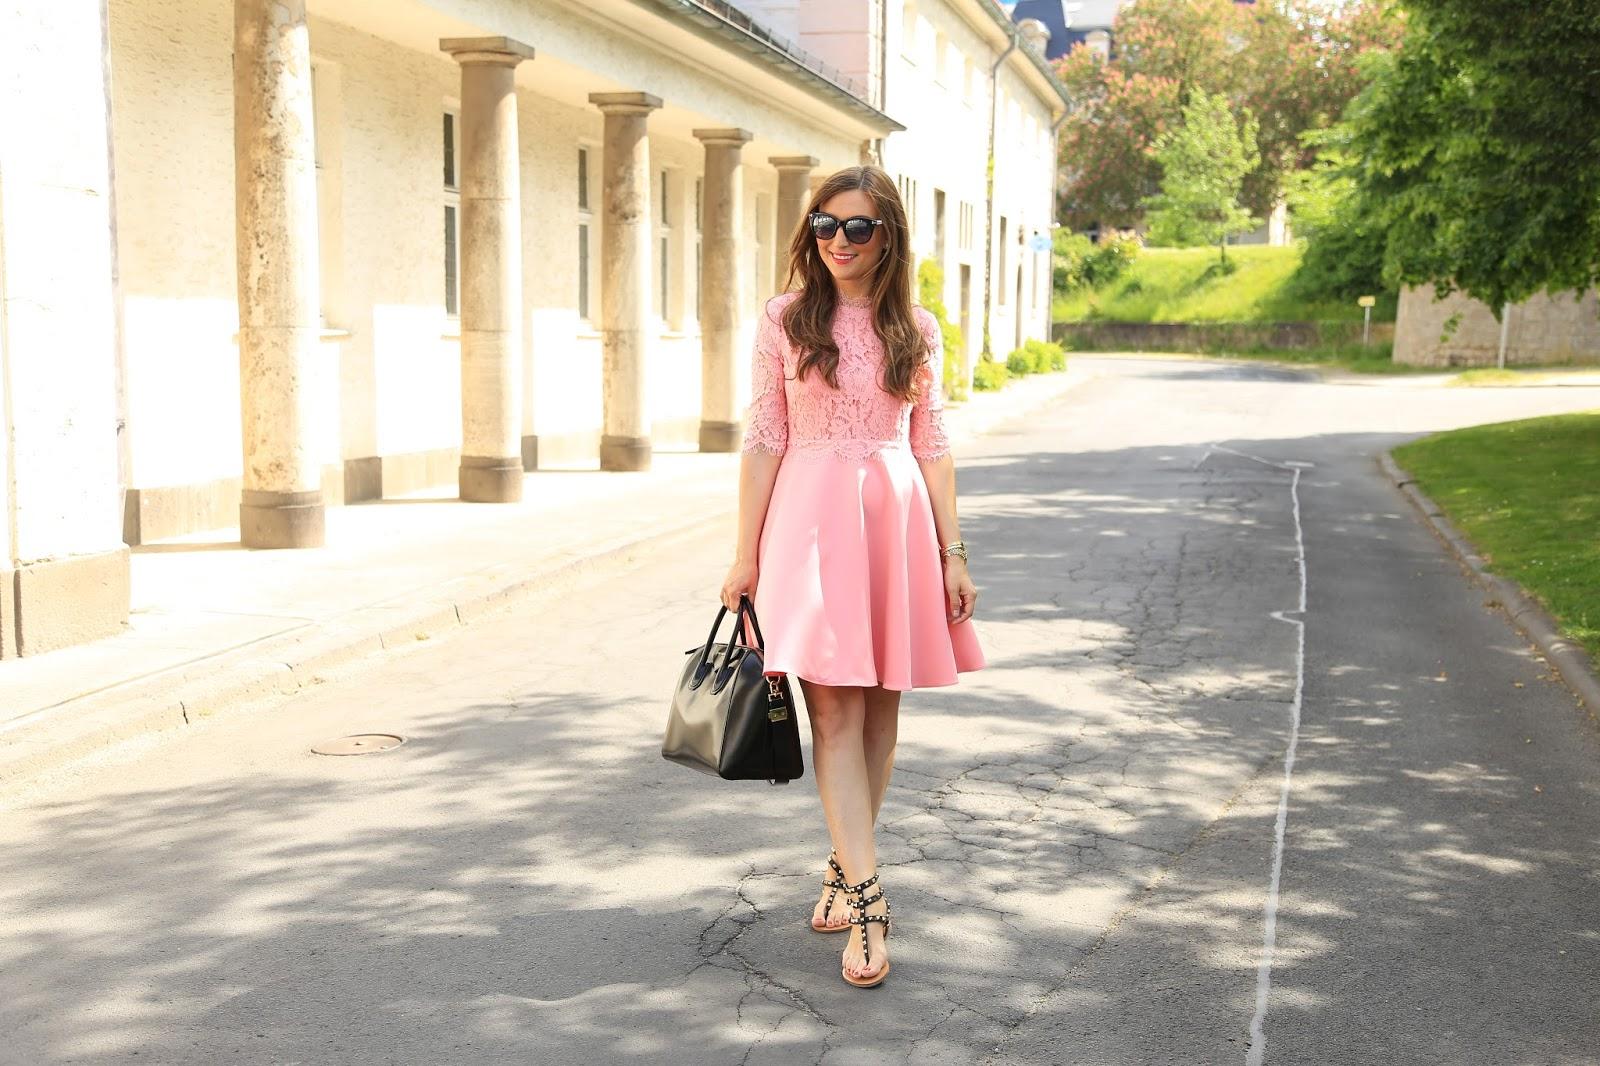 Frankfurt Fashionblogger - Blogger aus Frankfurt - Fashionstylebyjohanna - Givenchy Tasche Blogger